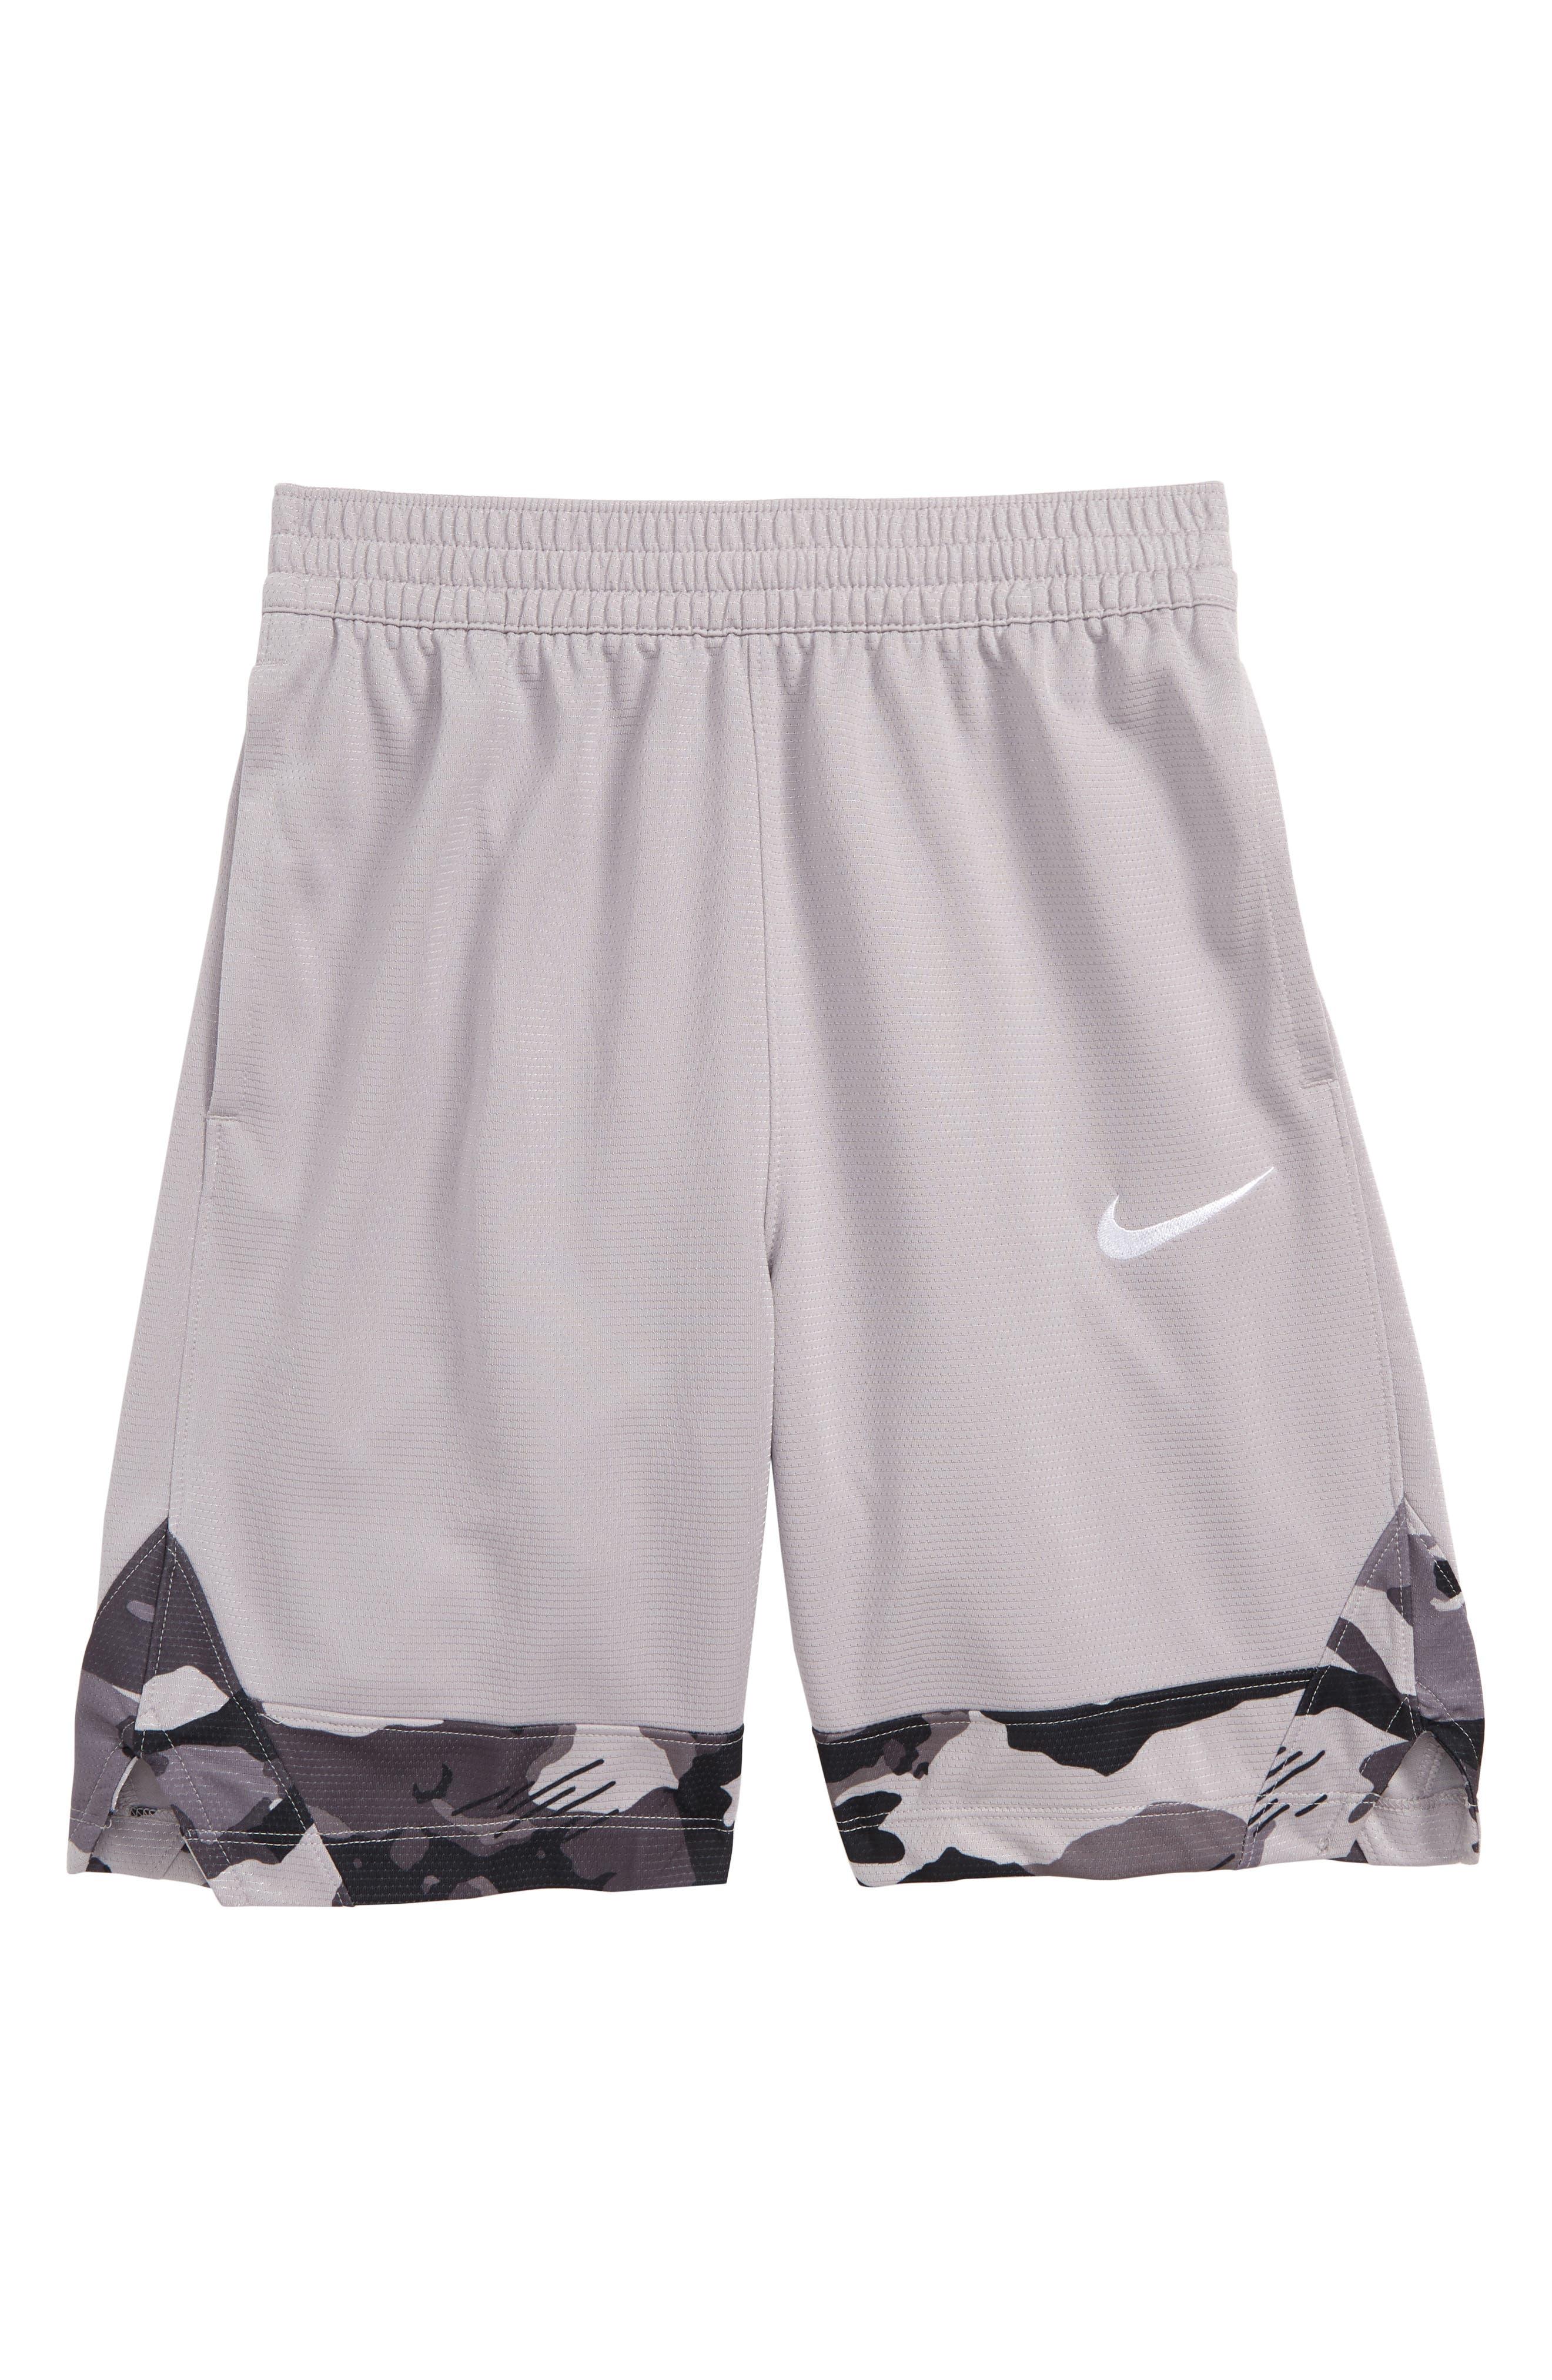 Boys Nike Icon Basketball Shorts Size XL (16)  Grey